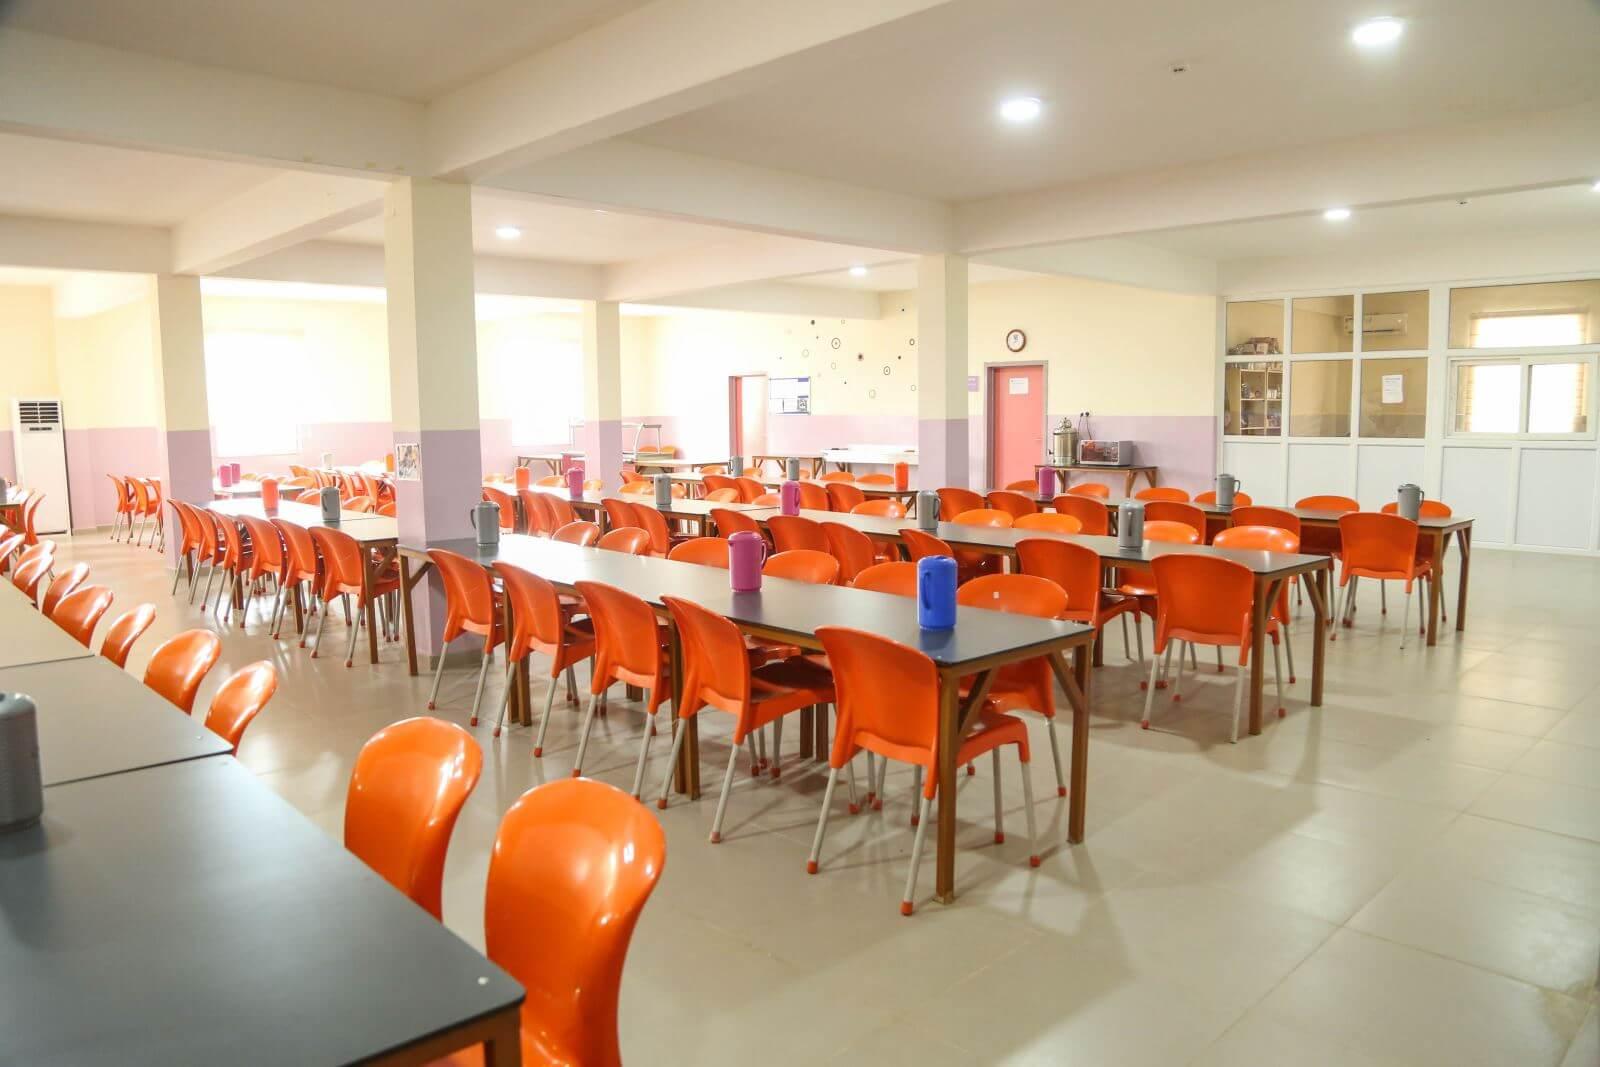 hostel-accomodation 2